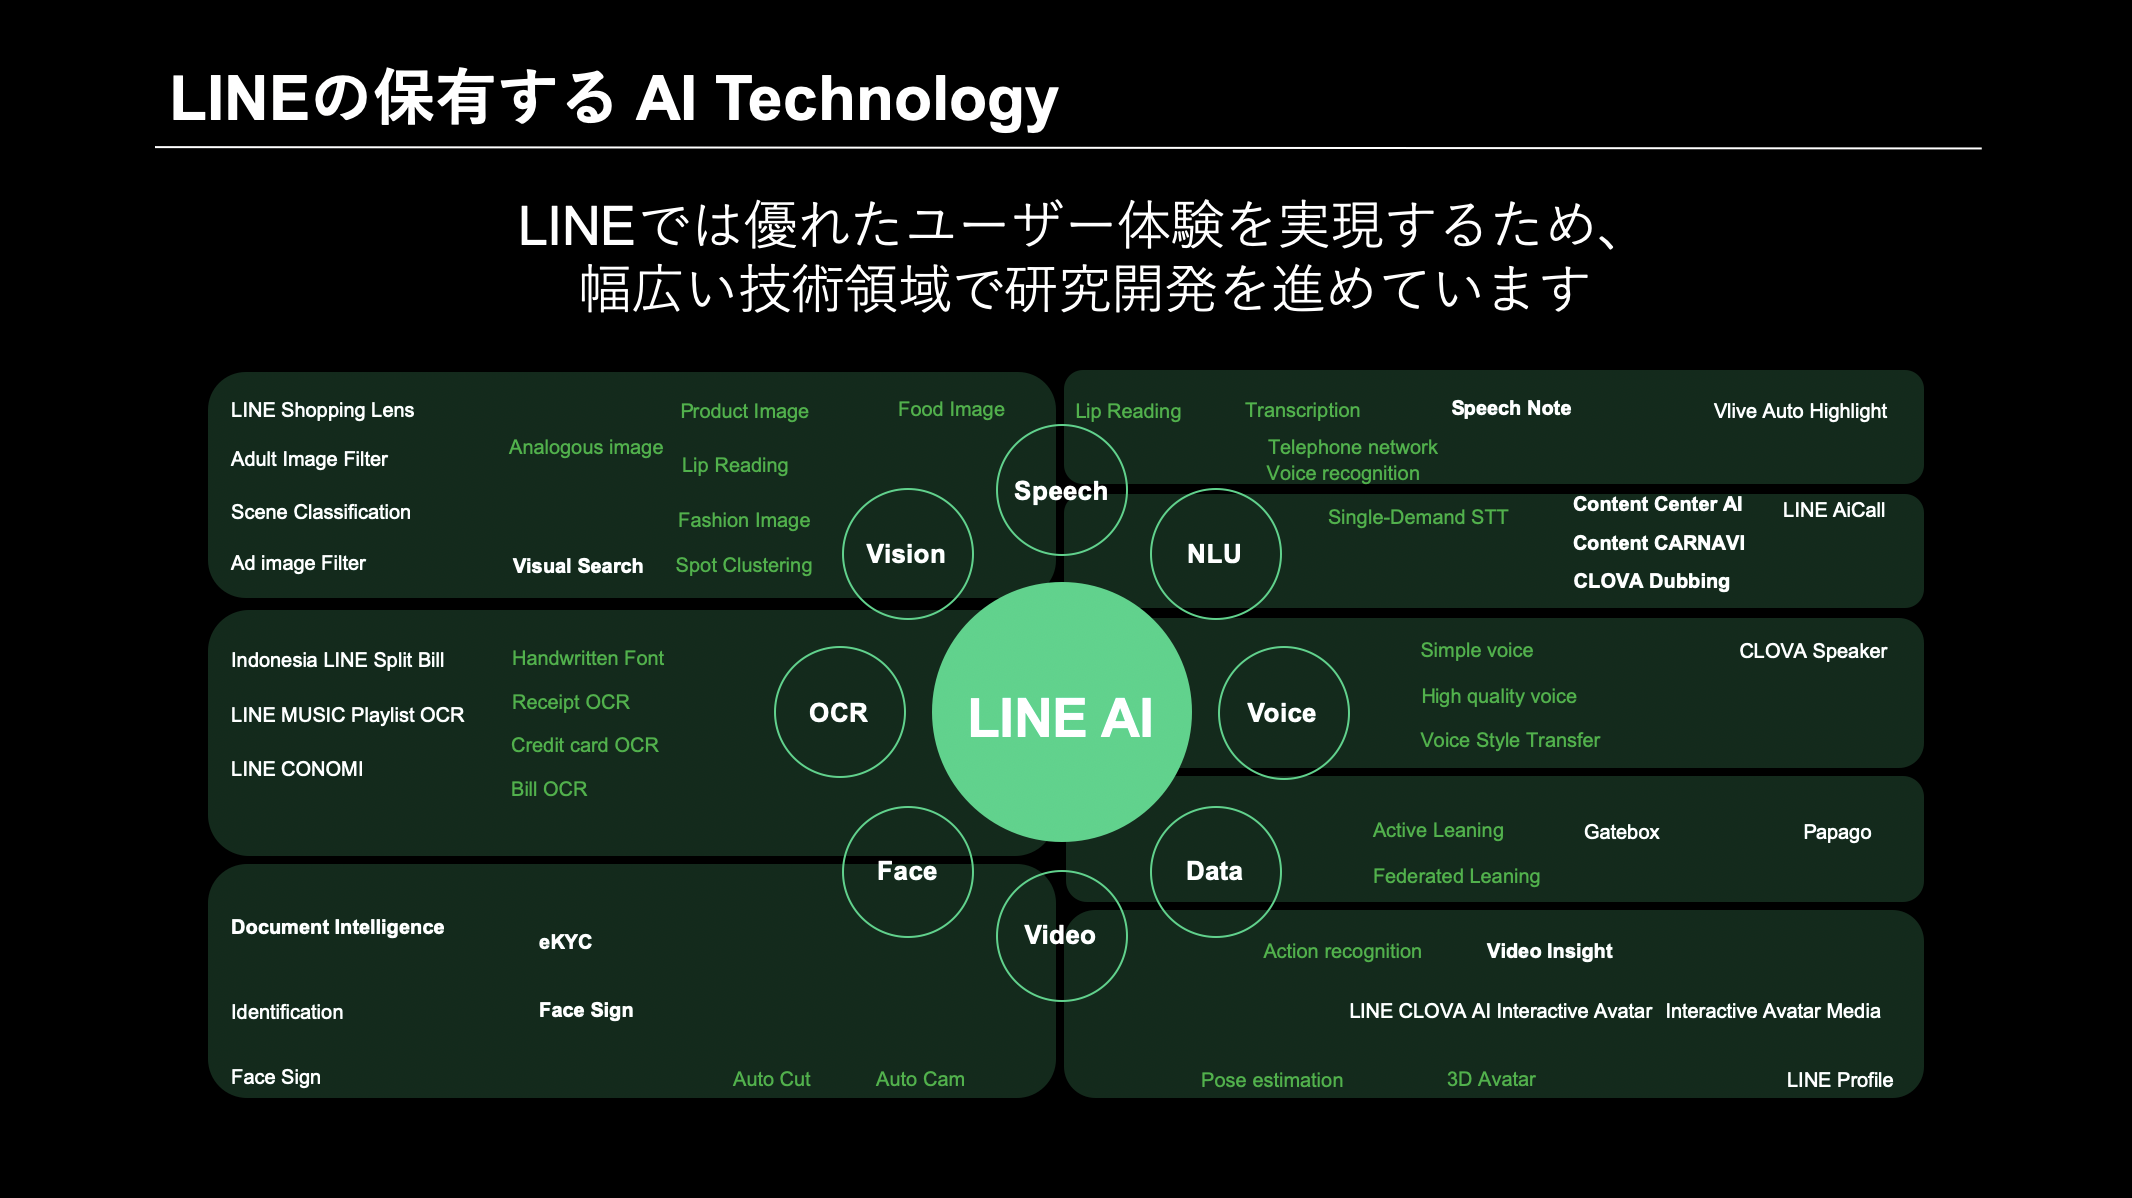 LINEのAI